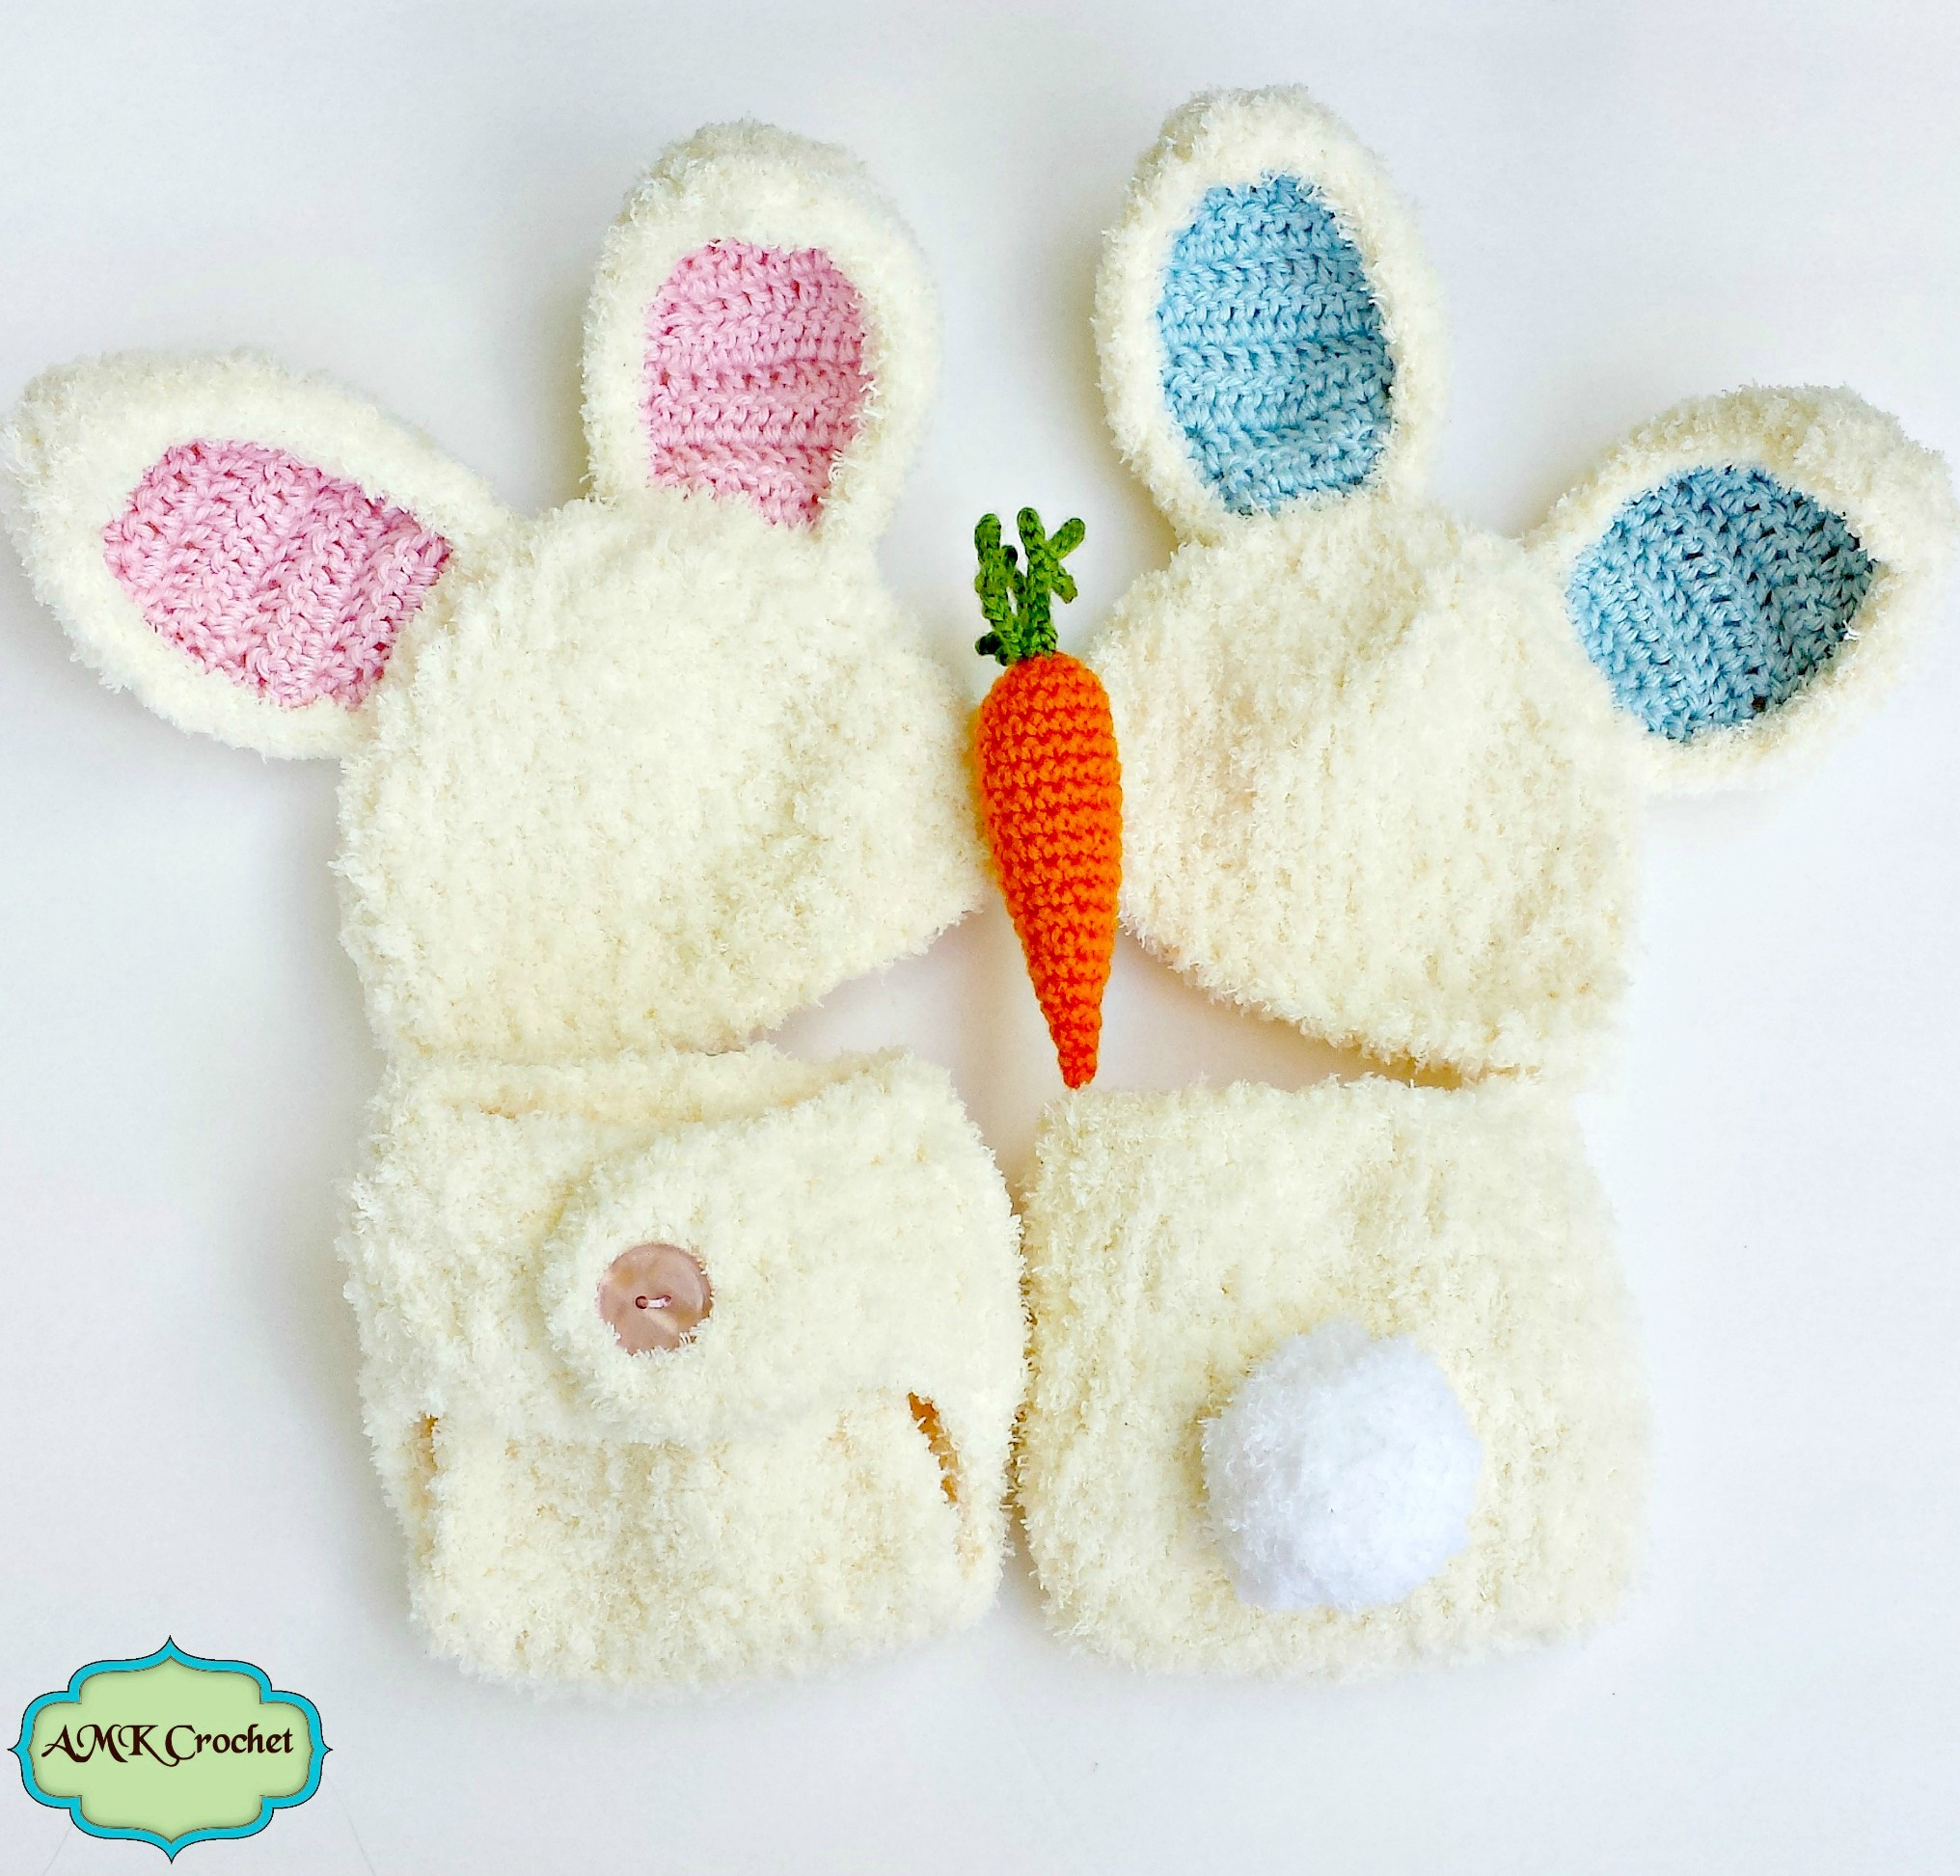 Crochet Newborn Fuzzy Bunny Hat And Diaper Cover Set With Amigurumi